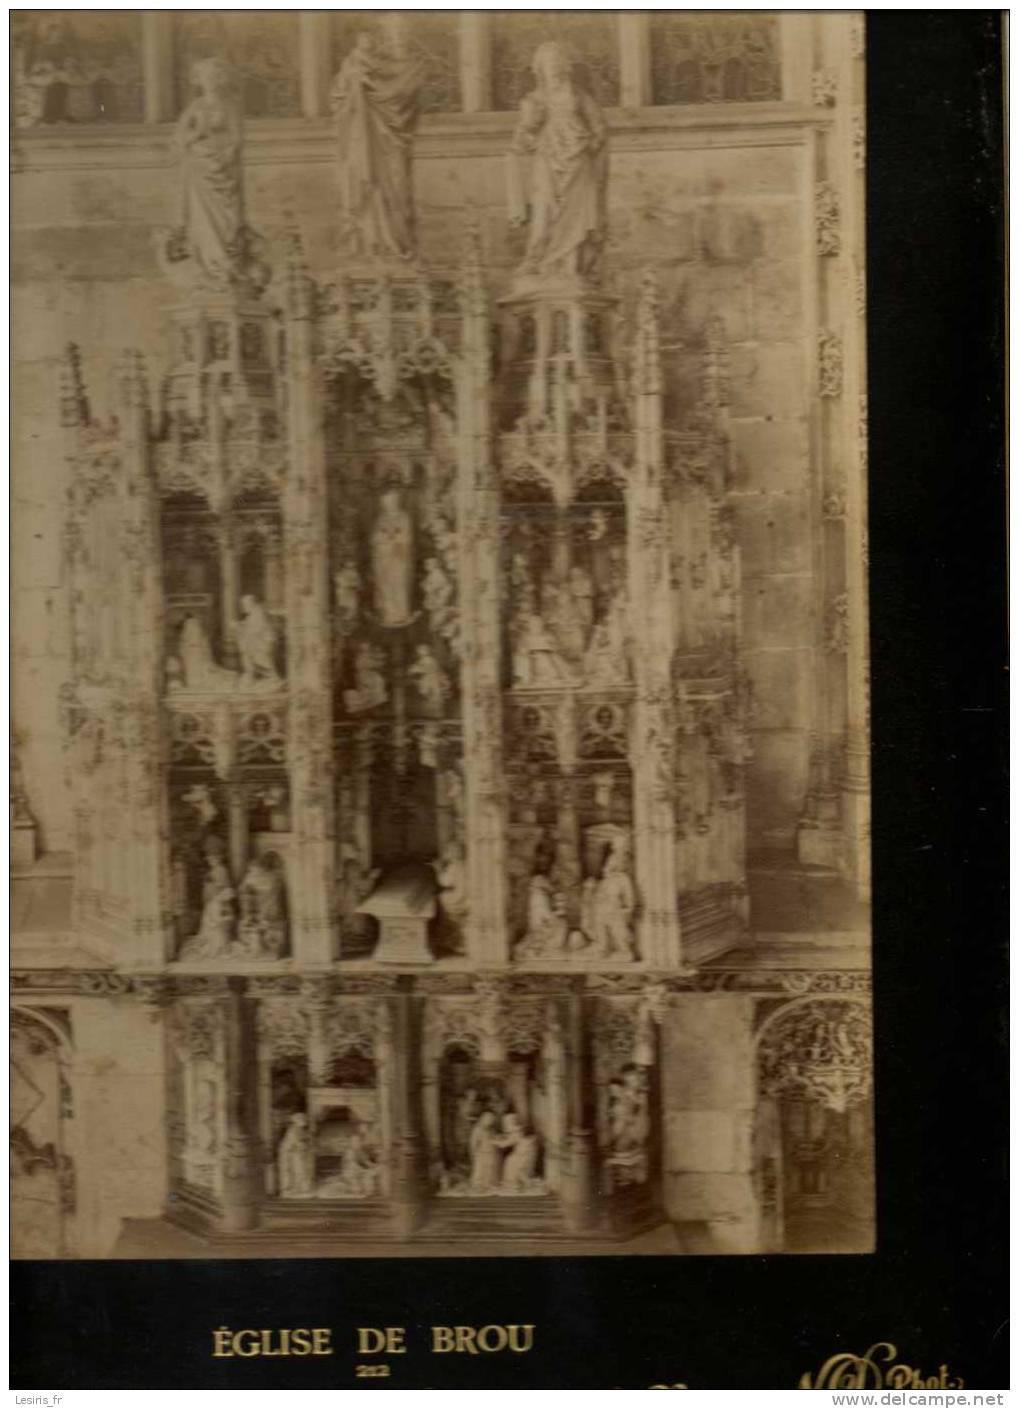 TRES GRANDE PHOTOGRAPHIE SUR CARTON - EGLISE DE BROU - 212 - RETABLE EN MARBRE DE LA CHAPELLE DE LA VIERGE - 1896 - N.D. - Fotos